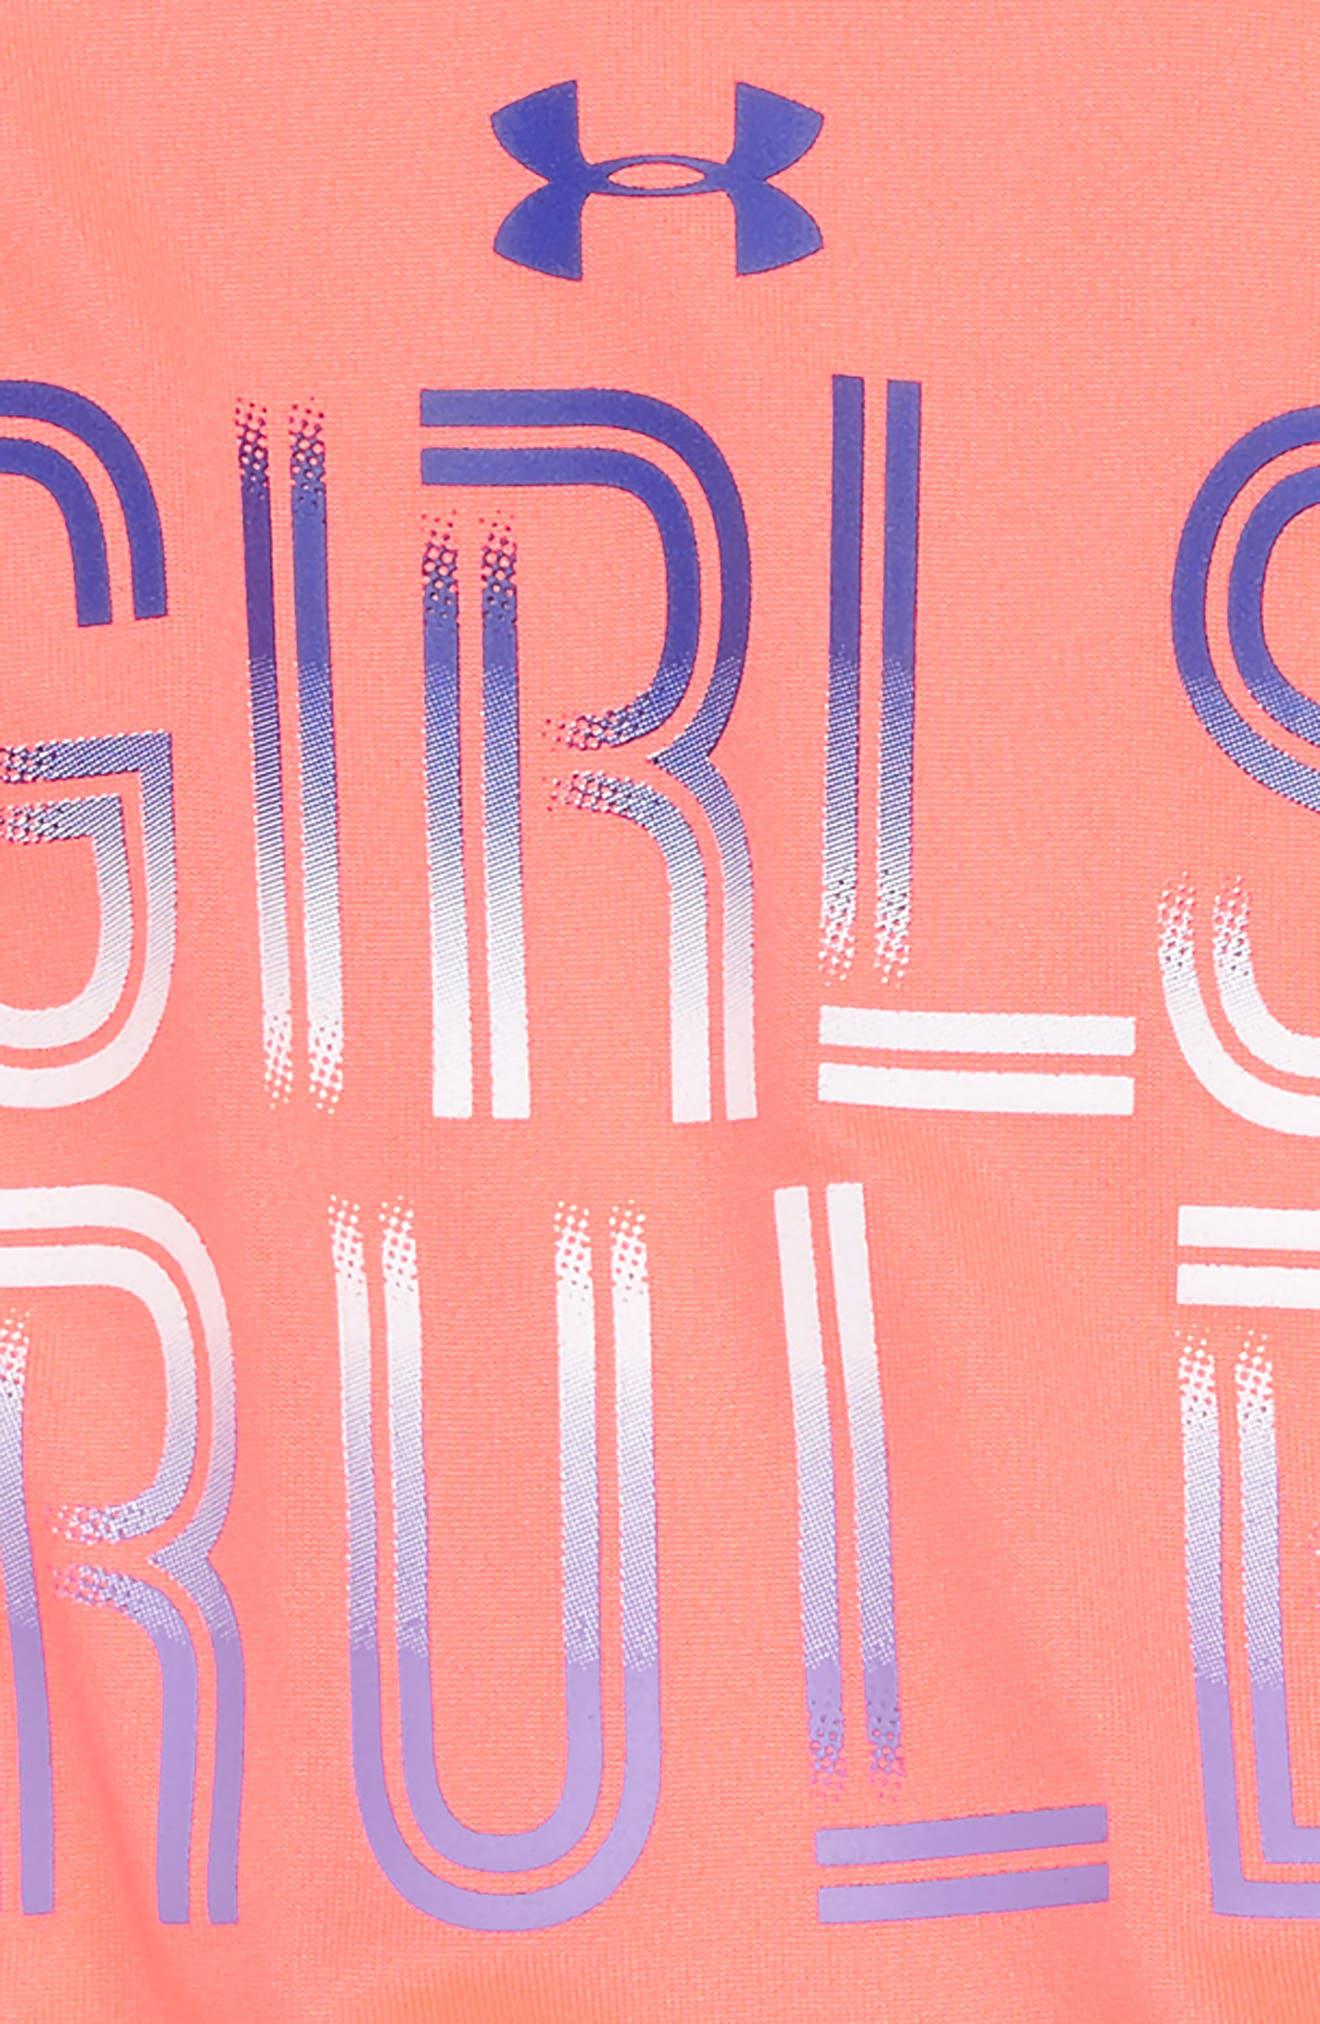 Girls Rule Tee & Shorts Set,                             Alternate thumbnail 2, color,                             950